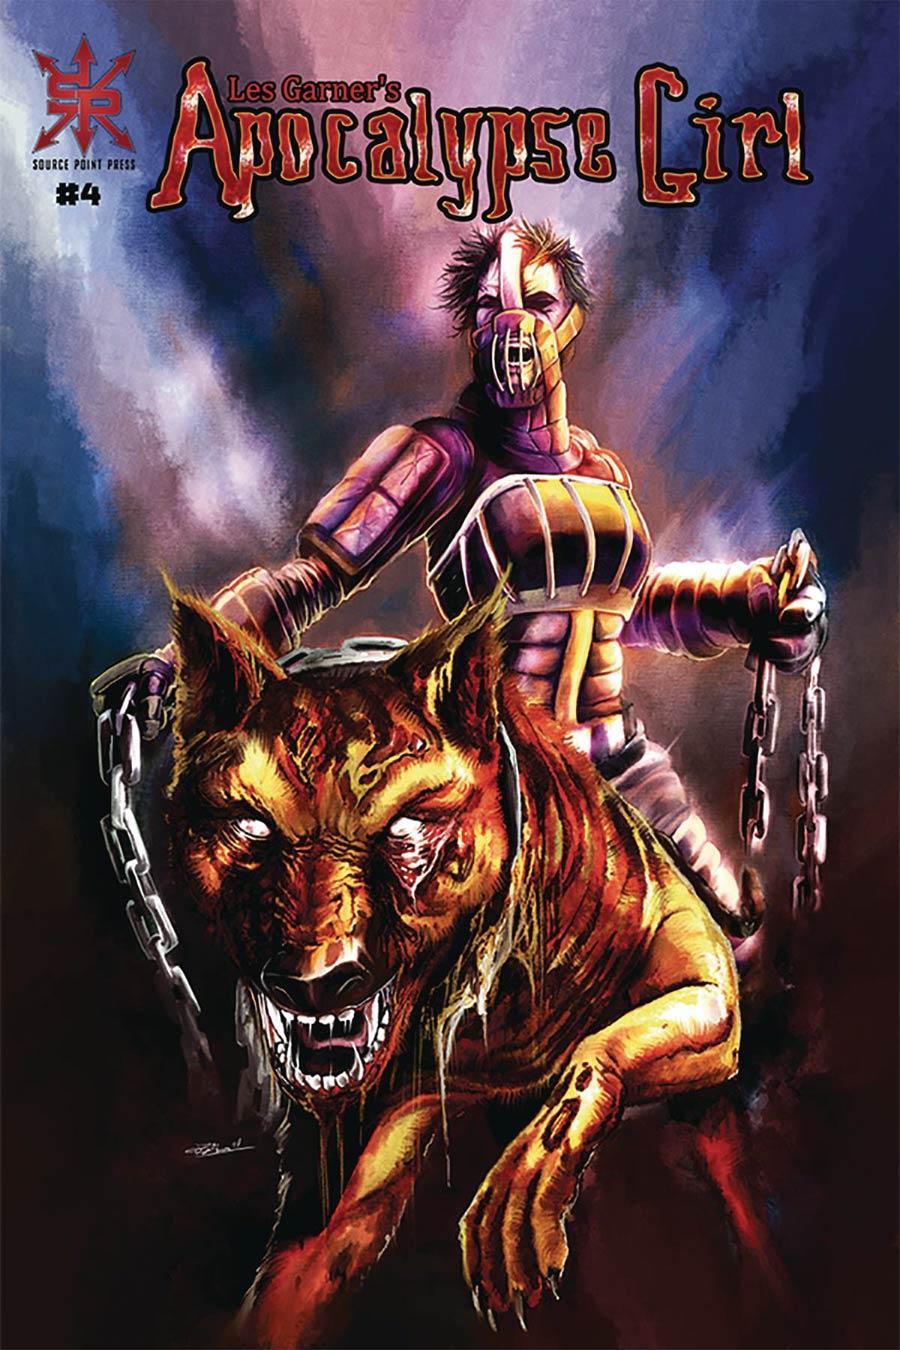 Apocalypse Girl (Source Point Press) #4